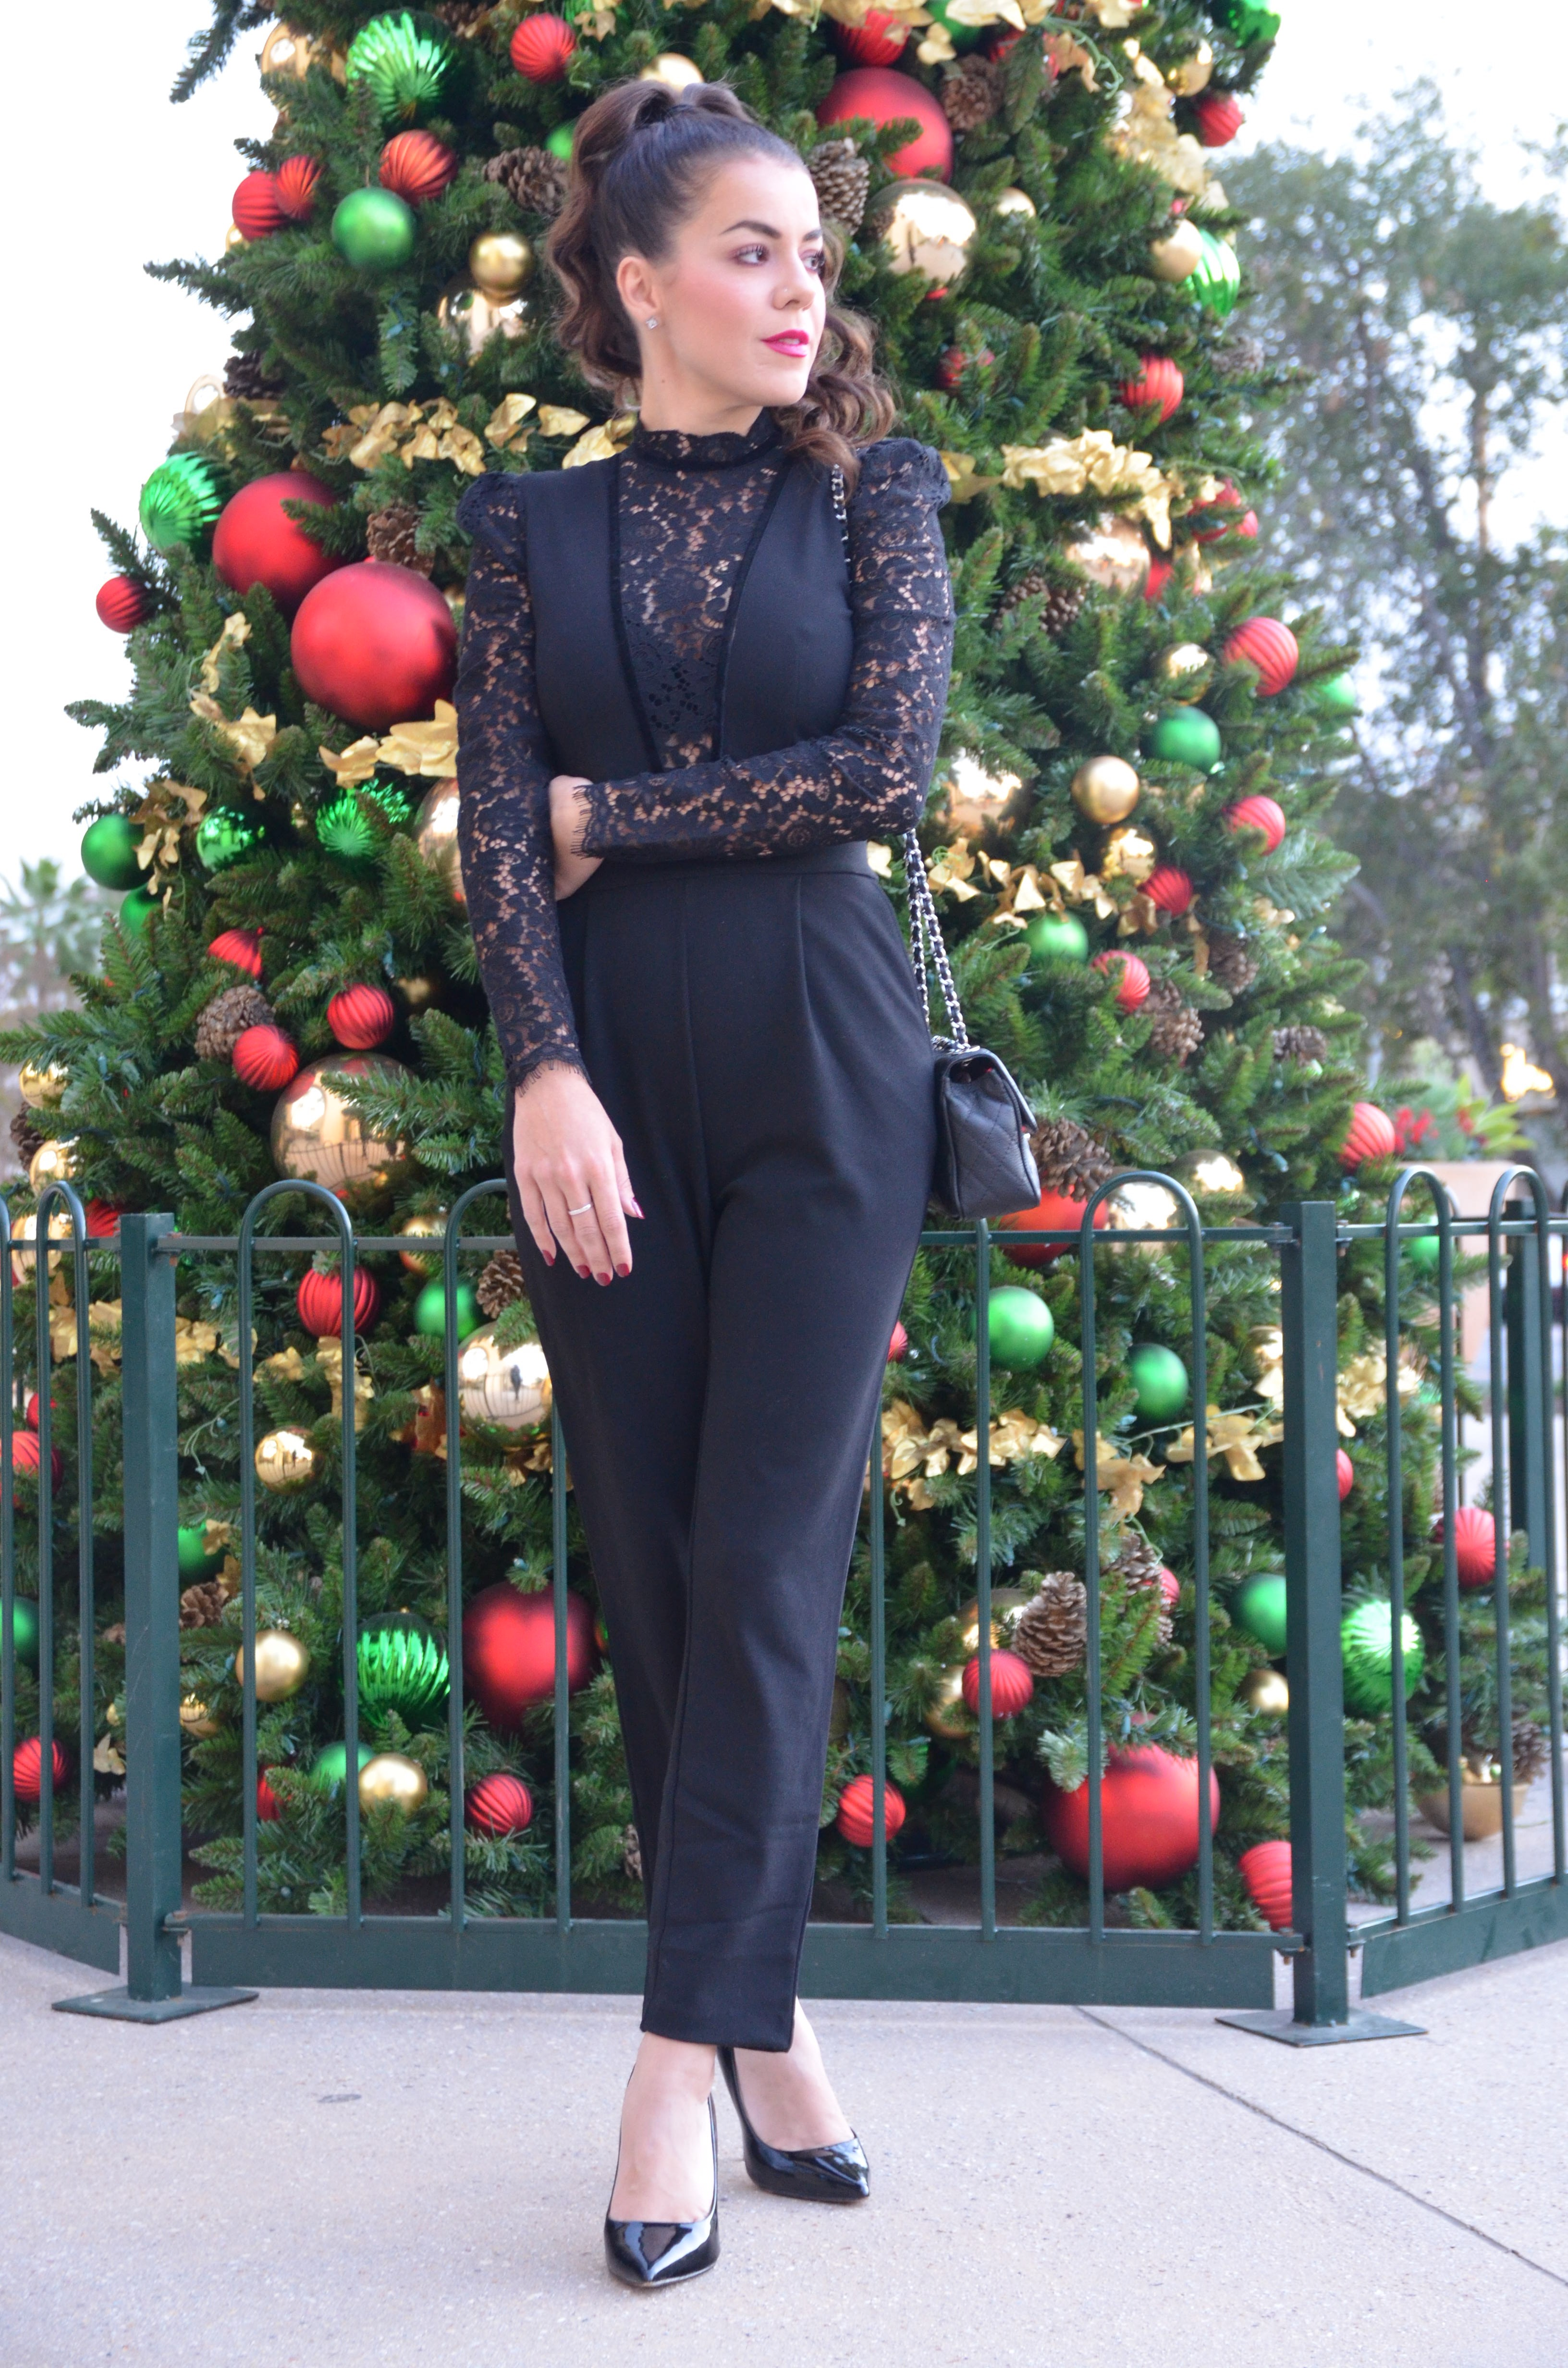 Holiday Fashions on a Budget x Amber Nicole Fashion